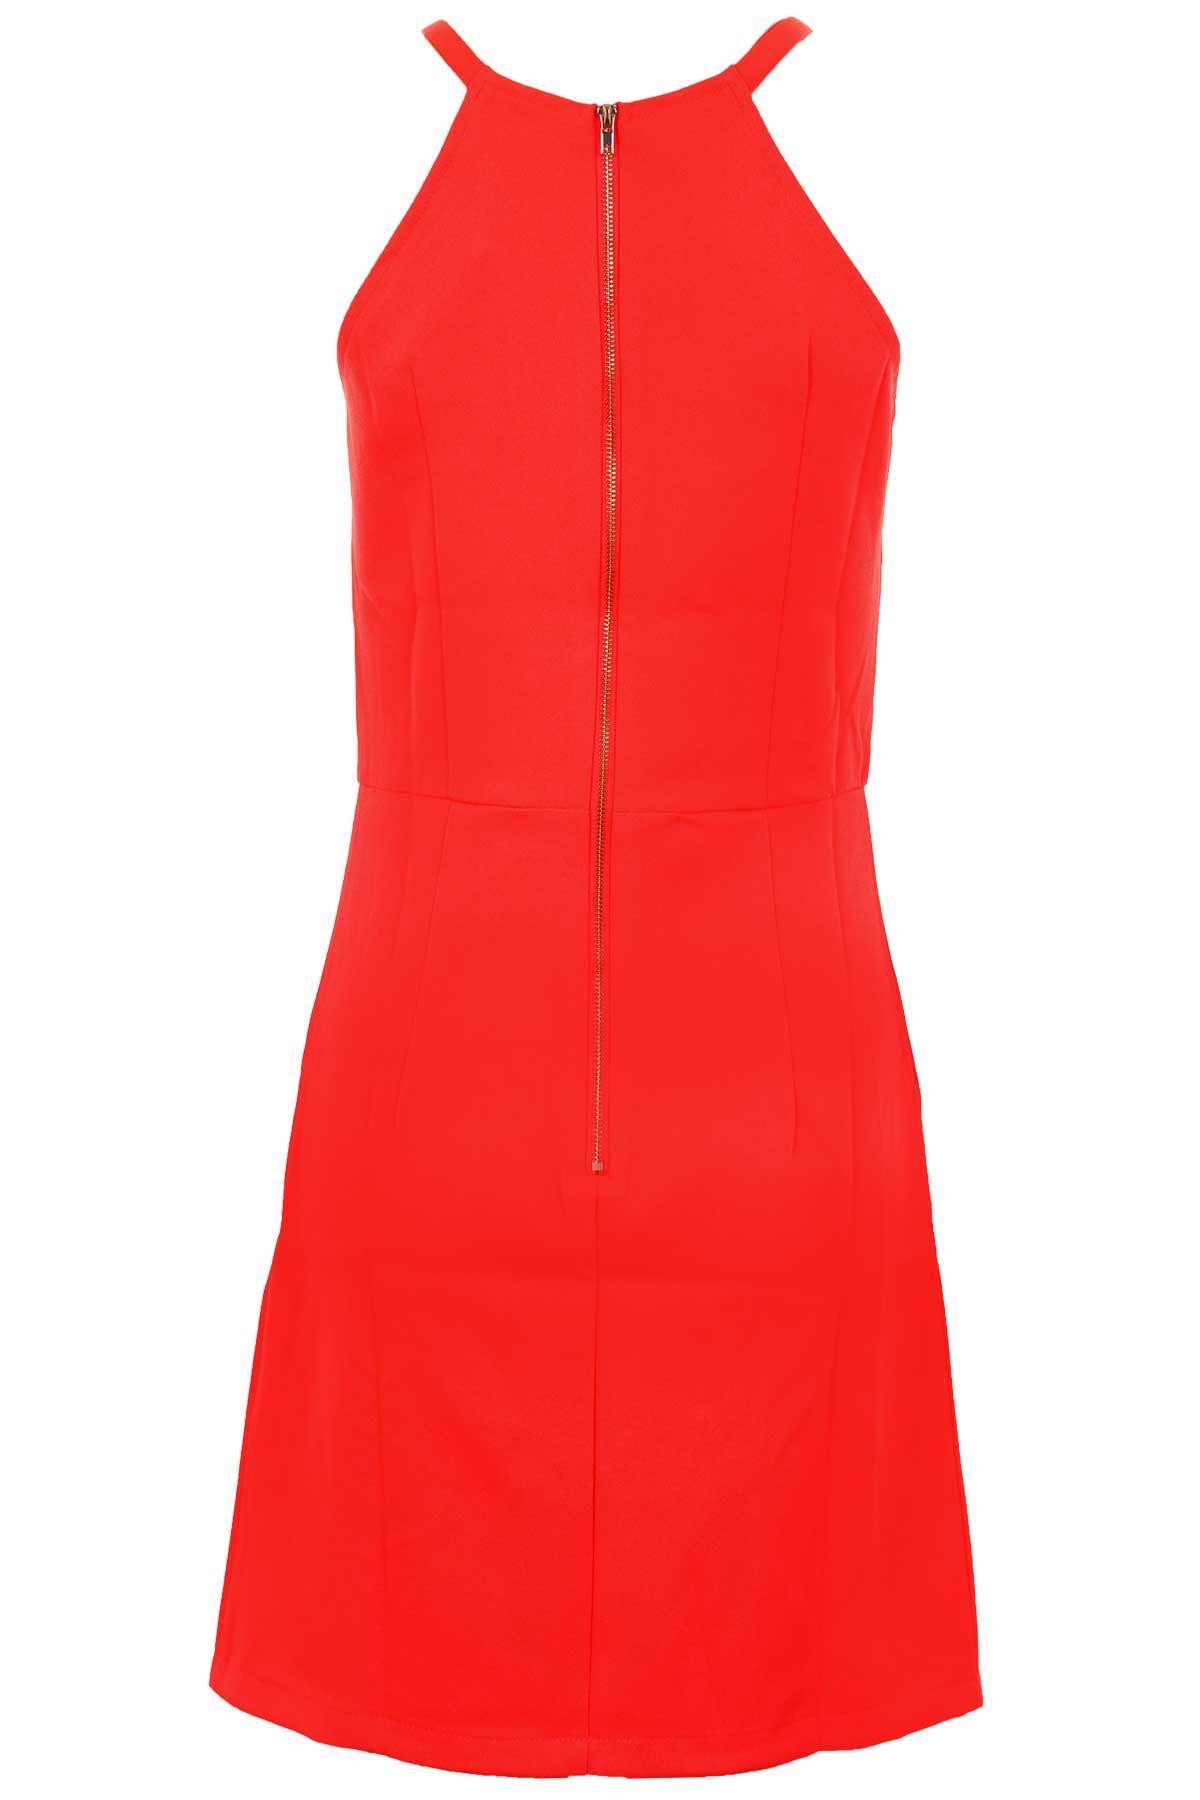 Women/'s Zip Back Sleeveless Studded Strap Ladies Party Smart Shift Dress 8-16